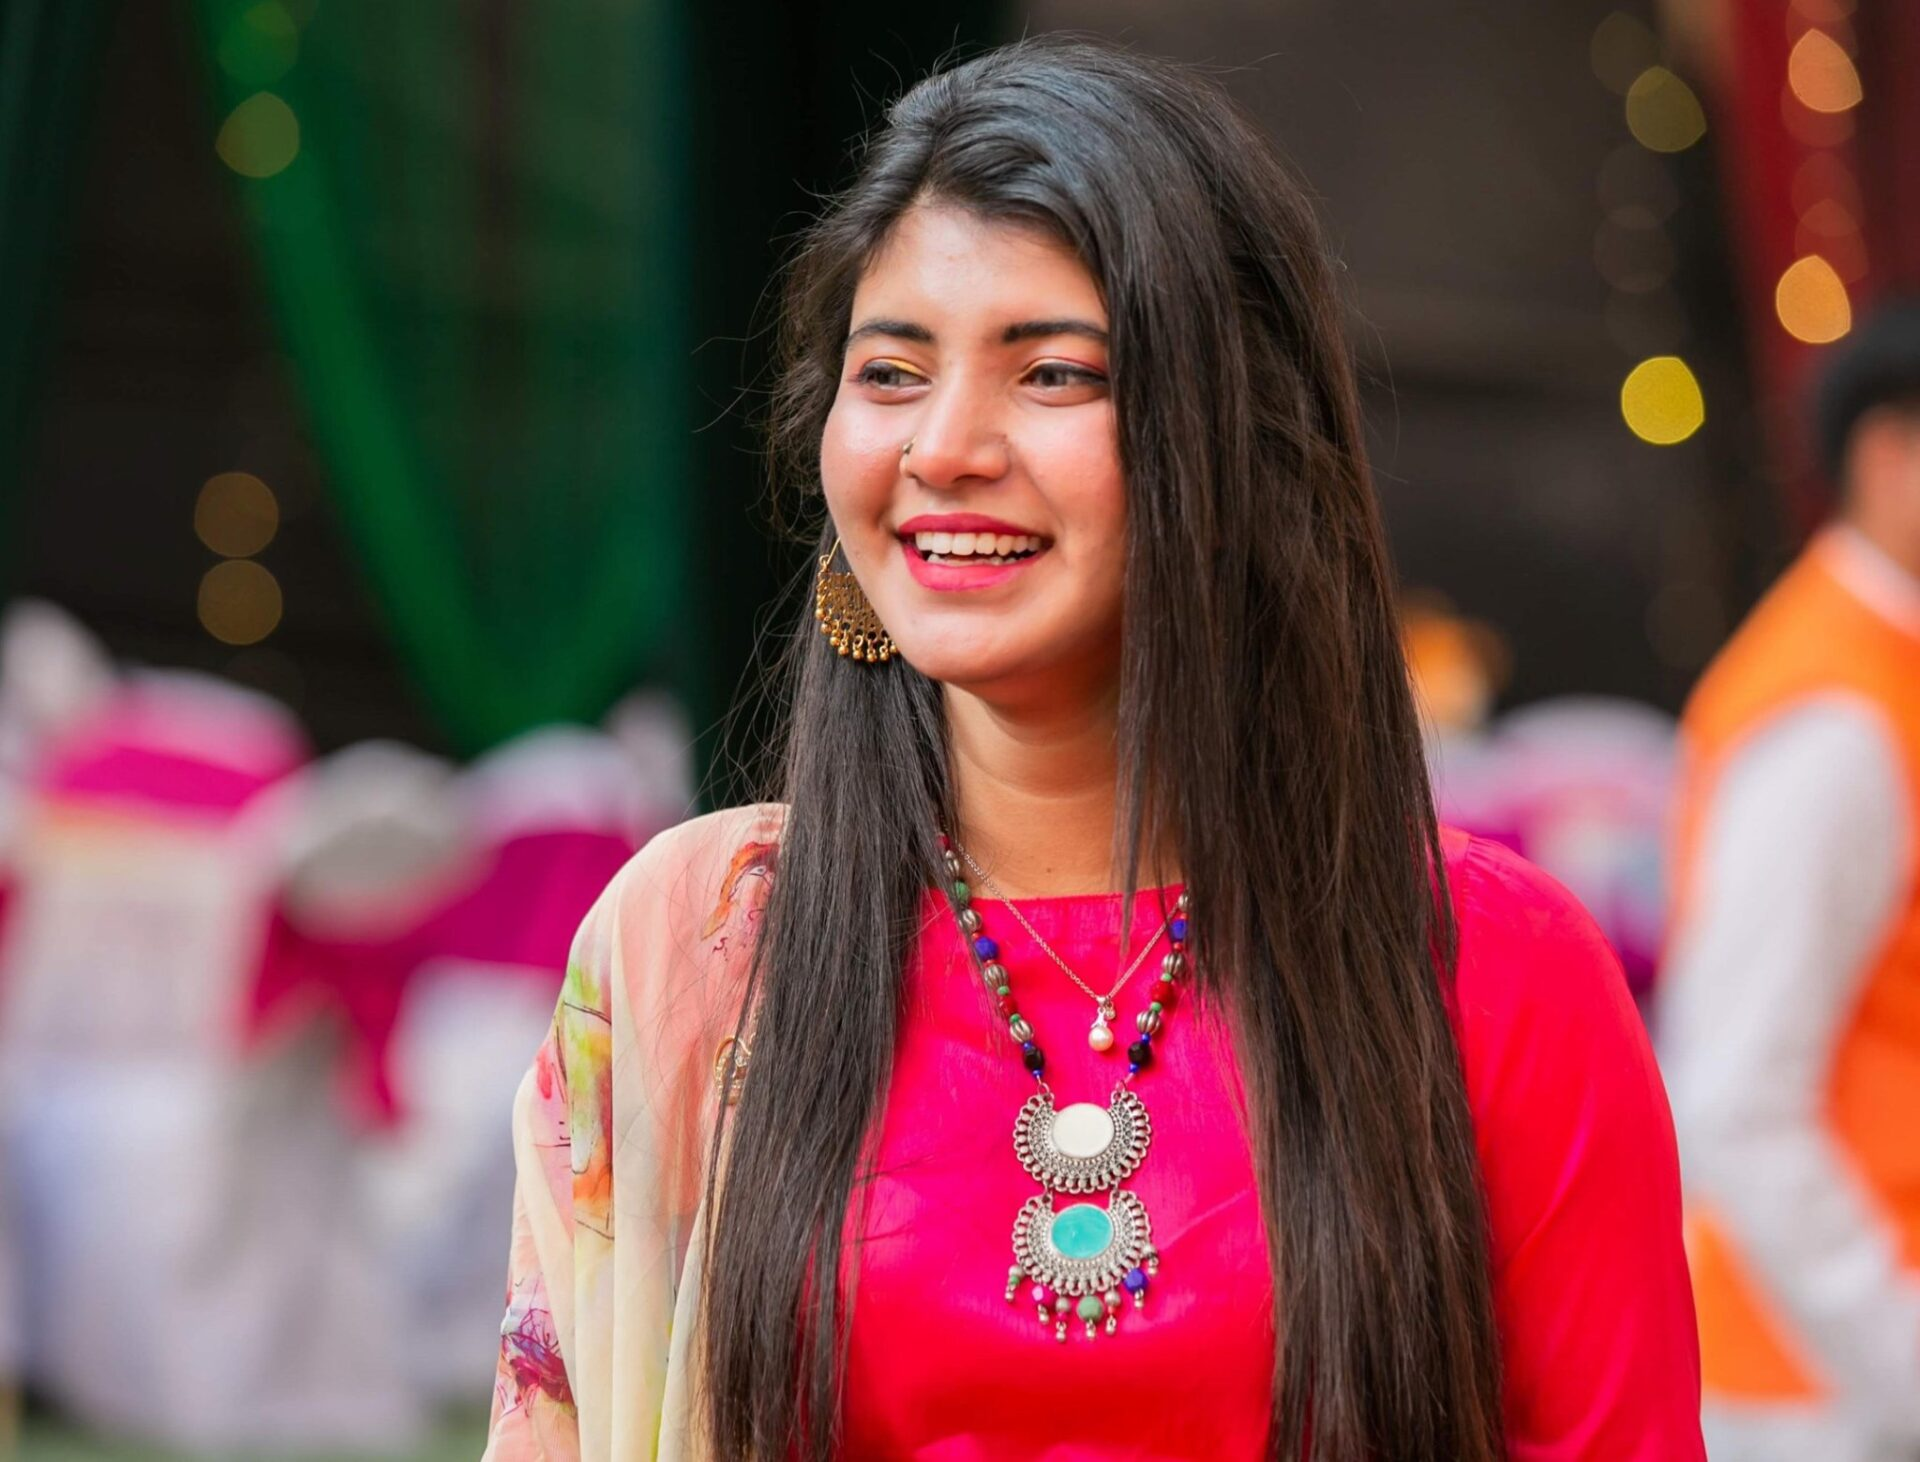 Syeda Nishat Naila